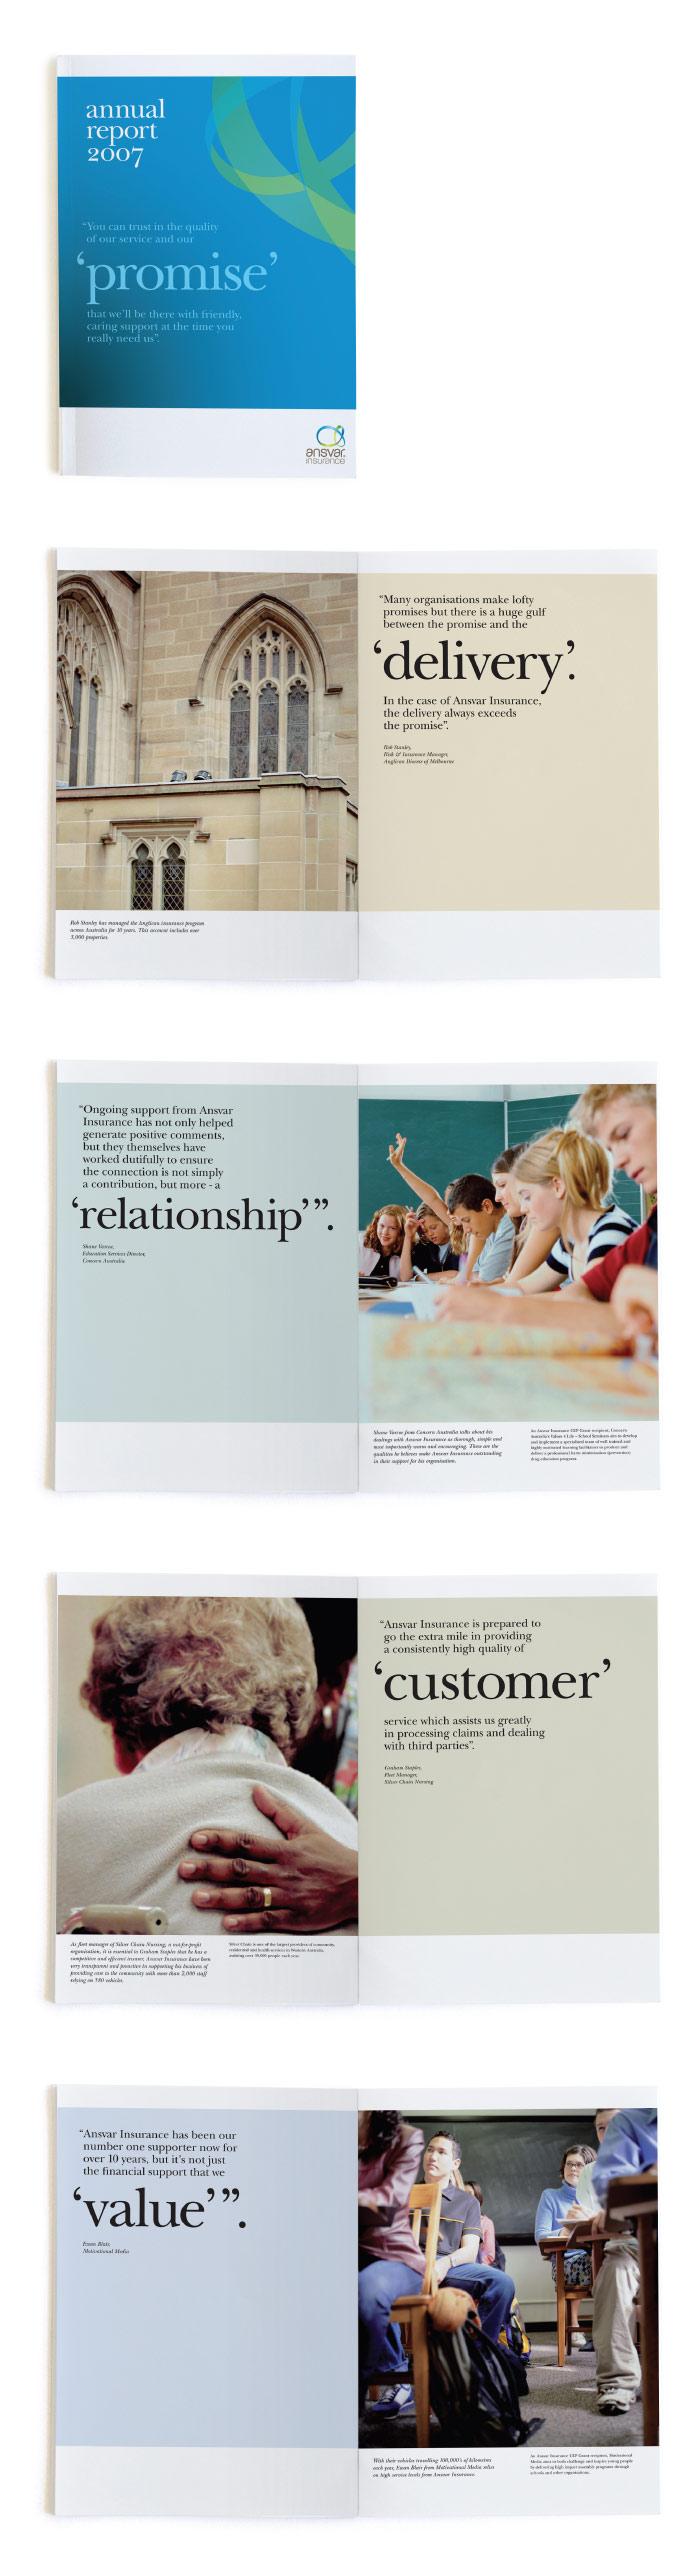 Ansvar Annual Report 2007